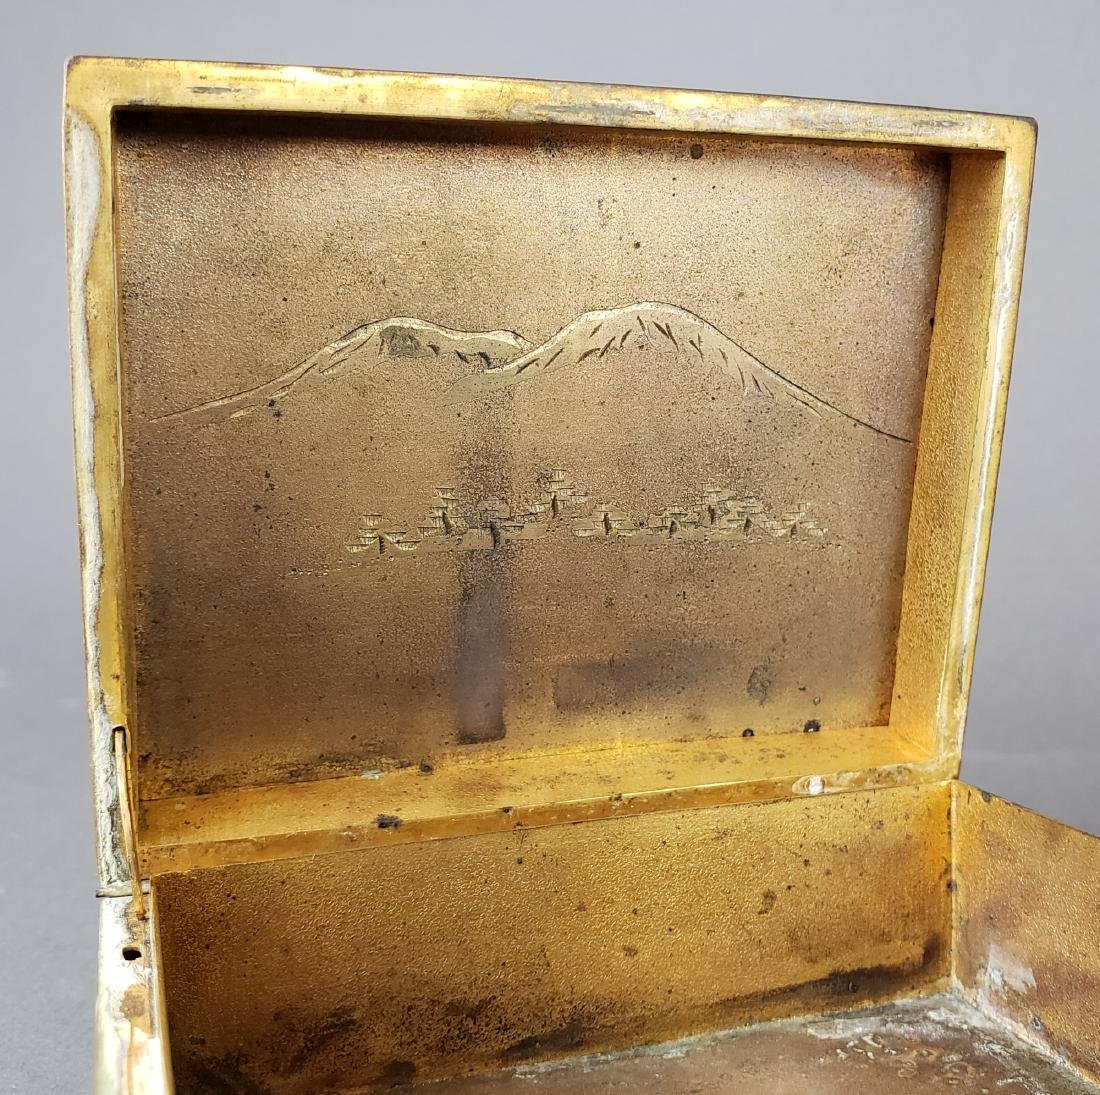 Chinese Enamel Jewelry Box - 4